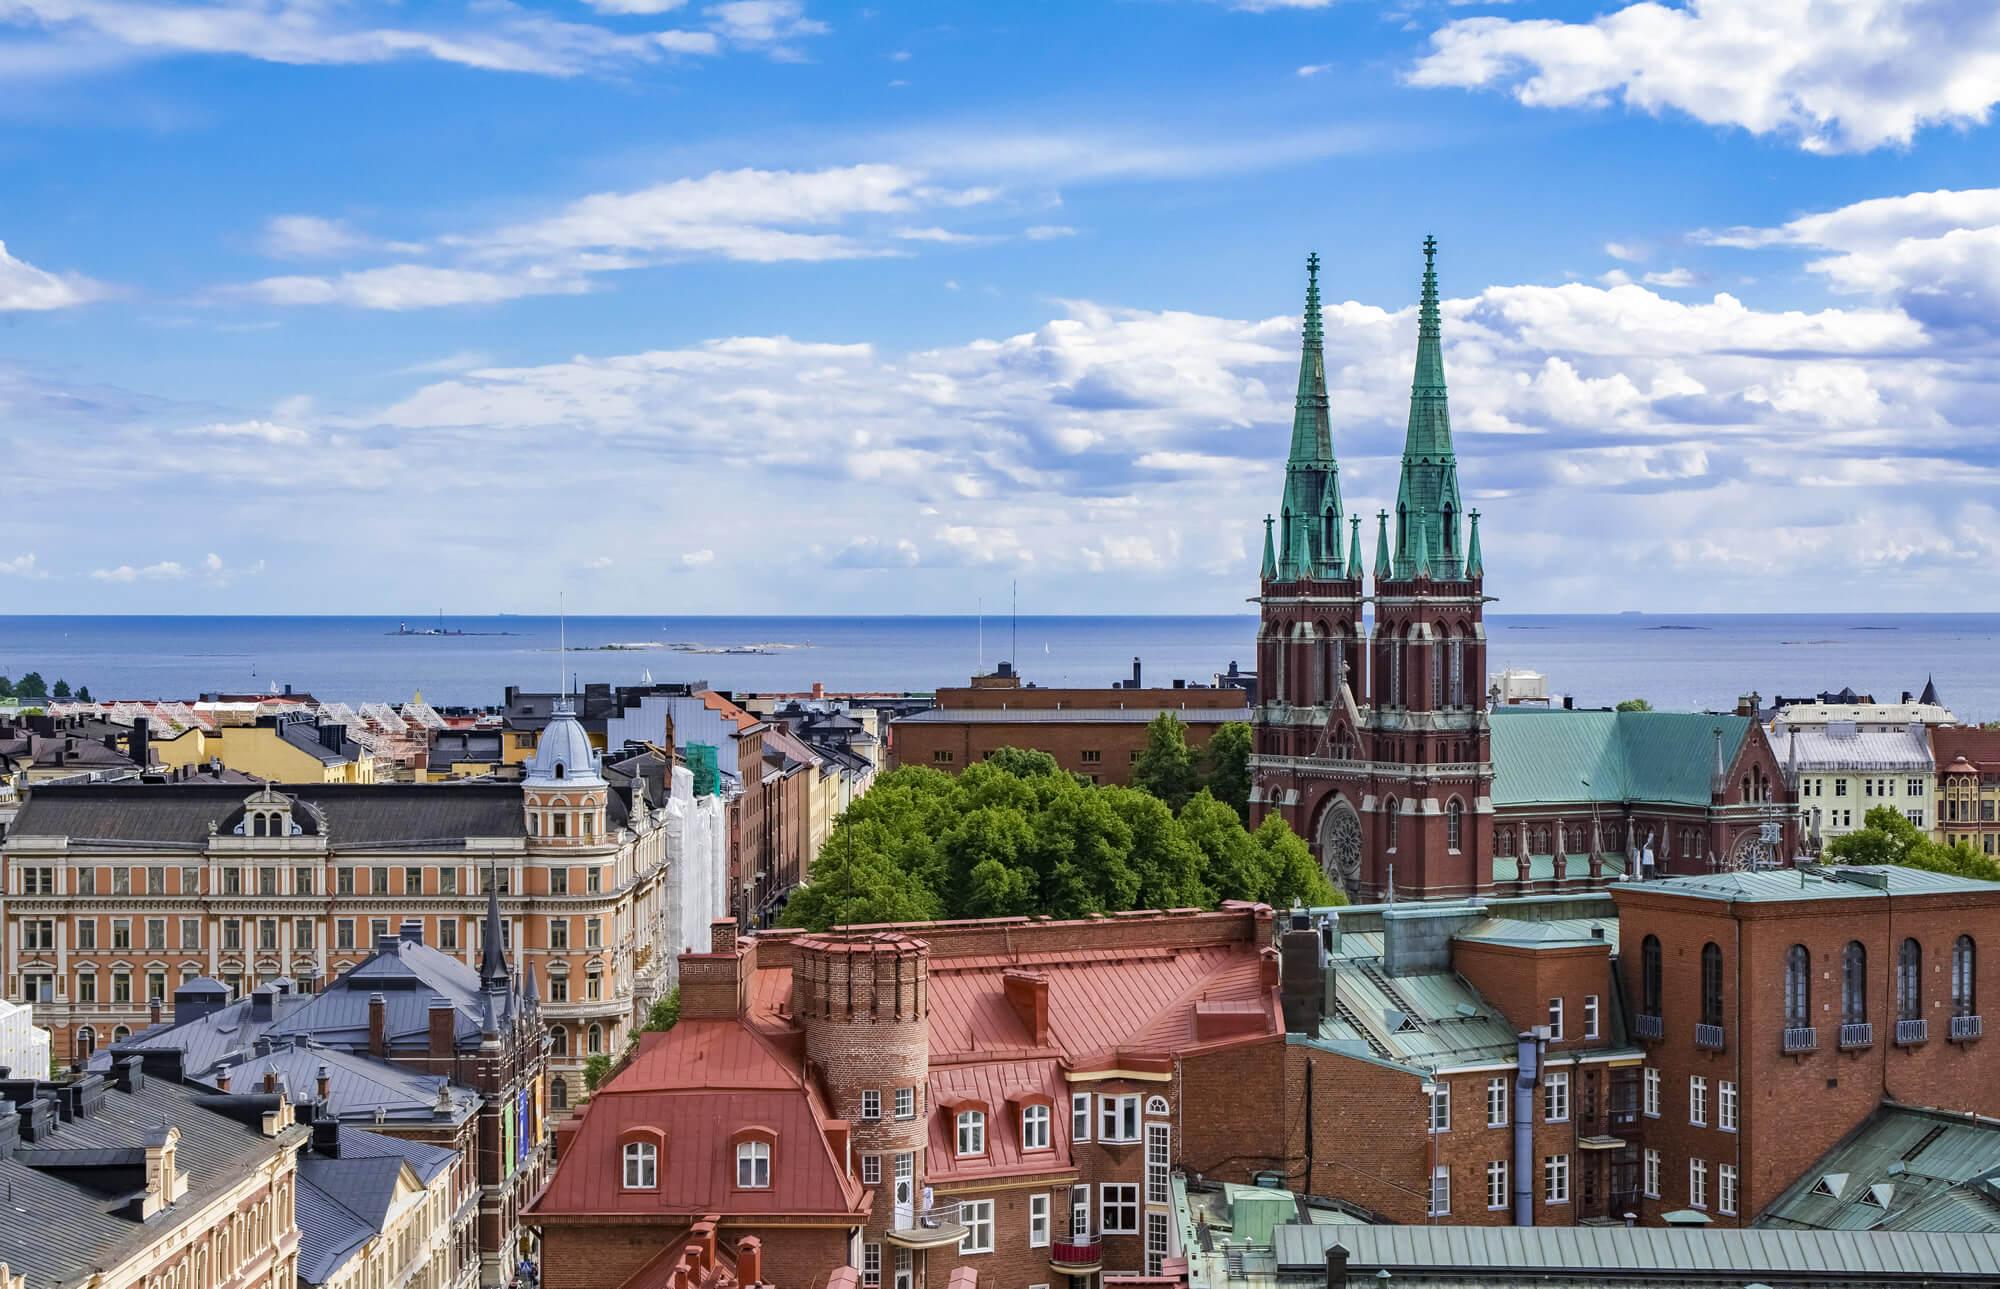 Aerial view of Helsinki, Finland